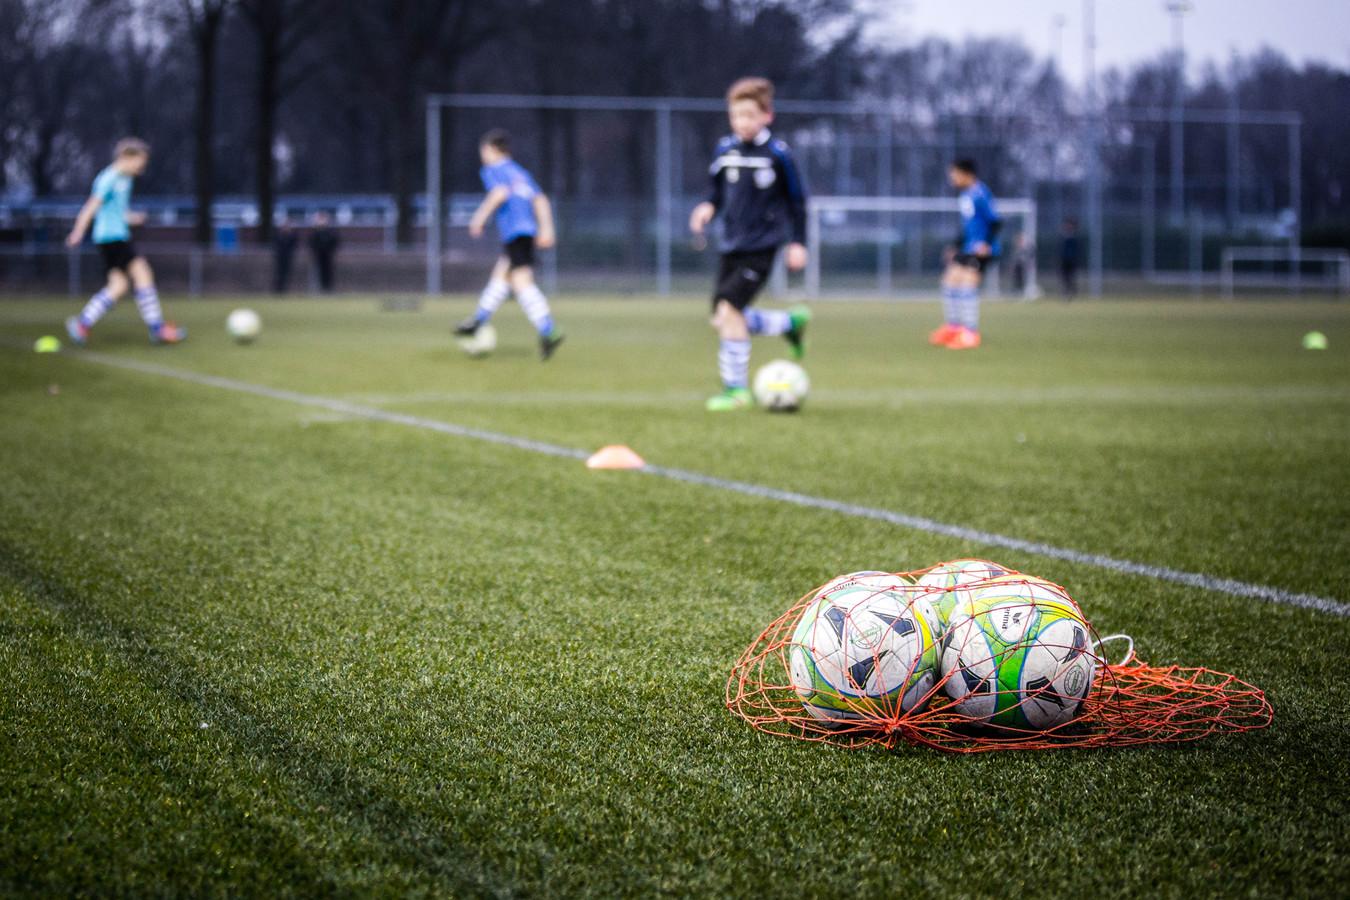 De jeugdtraining bij voetbalvereniging Bladella.